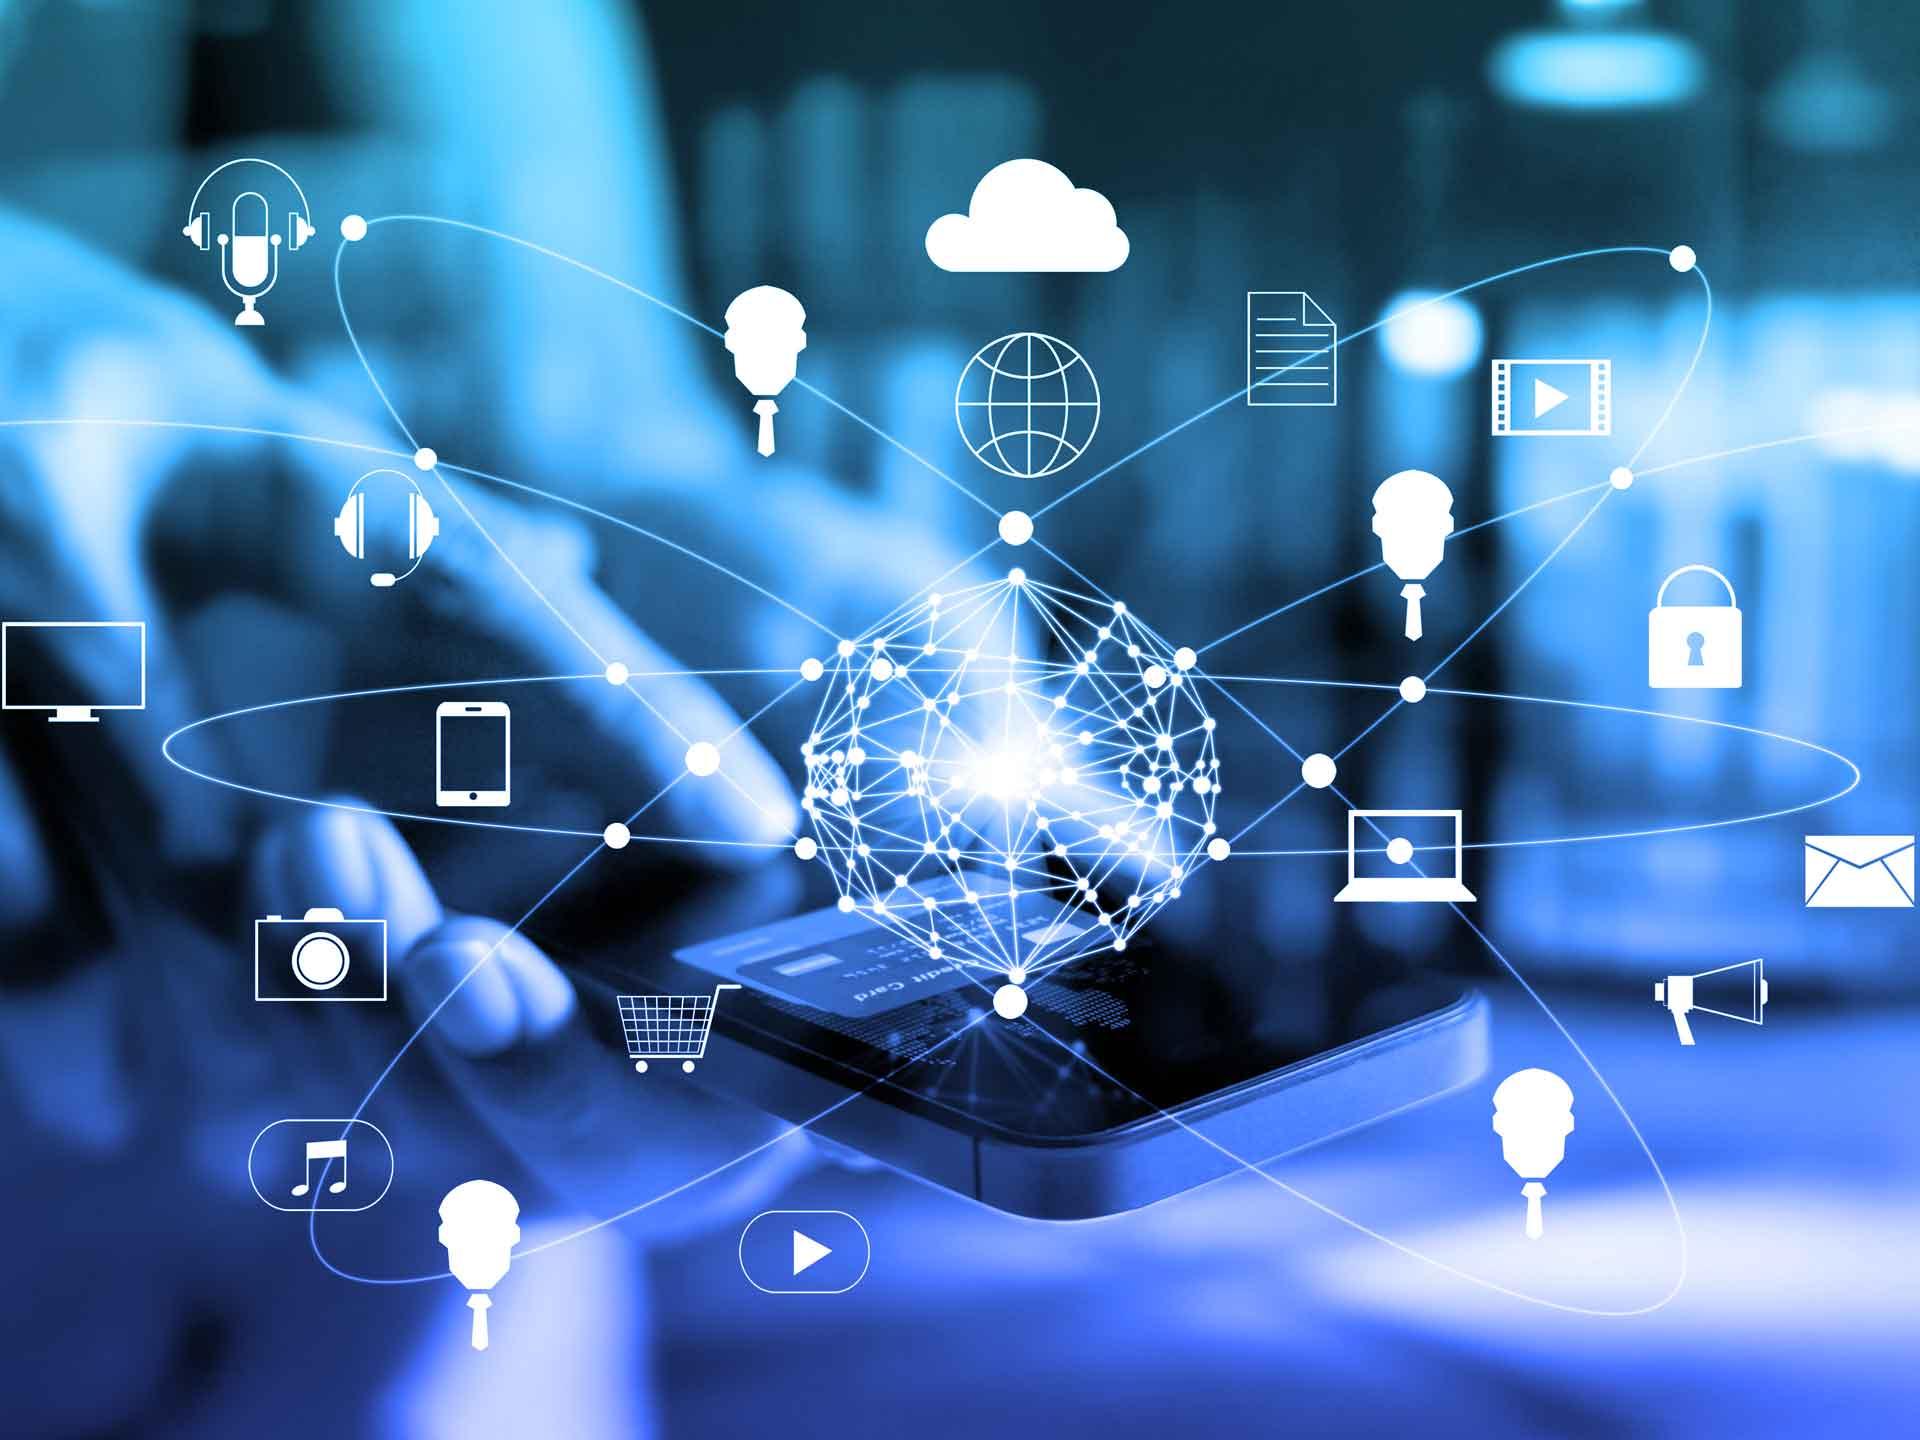 Microsoft Dynamics 365 Customer Service omnichannel engagement